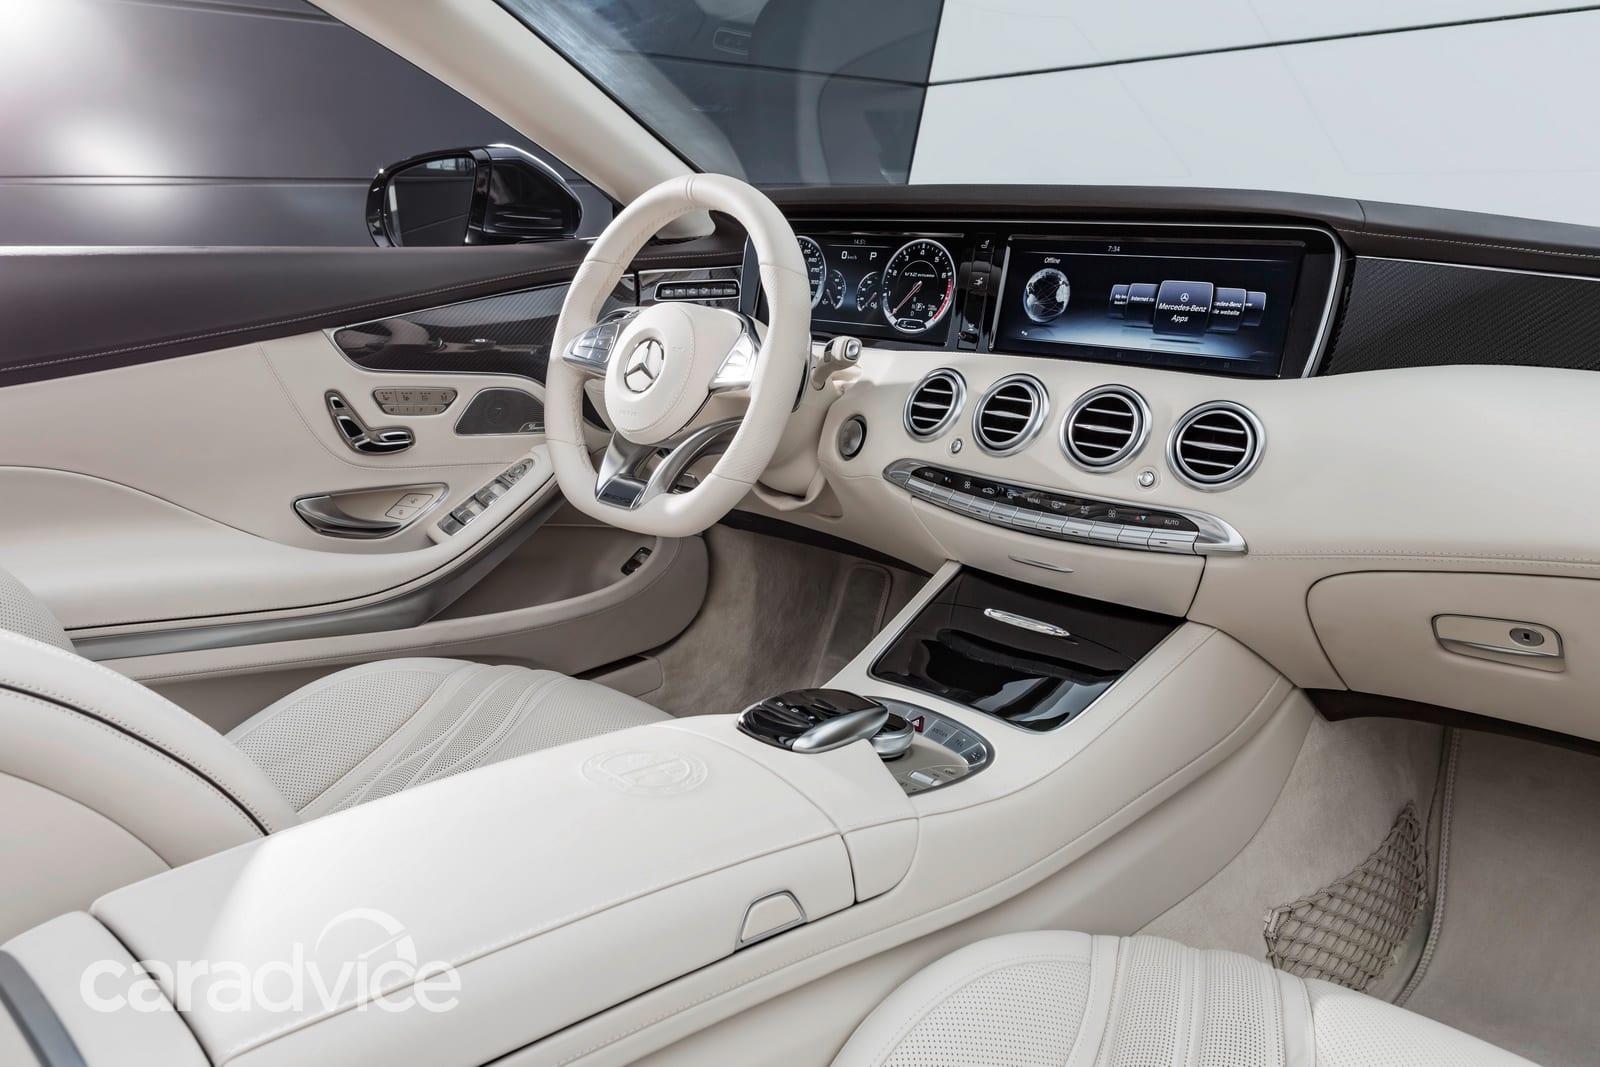 2016 Mercedes-AMG S65 Cabriolet revealed - UPDATE | CarAdvice